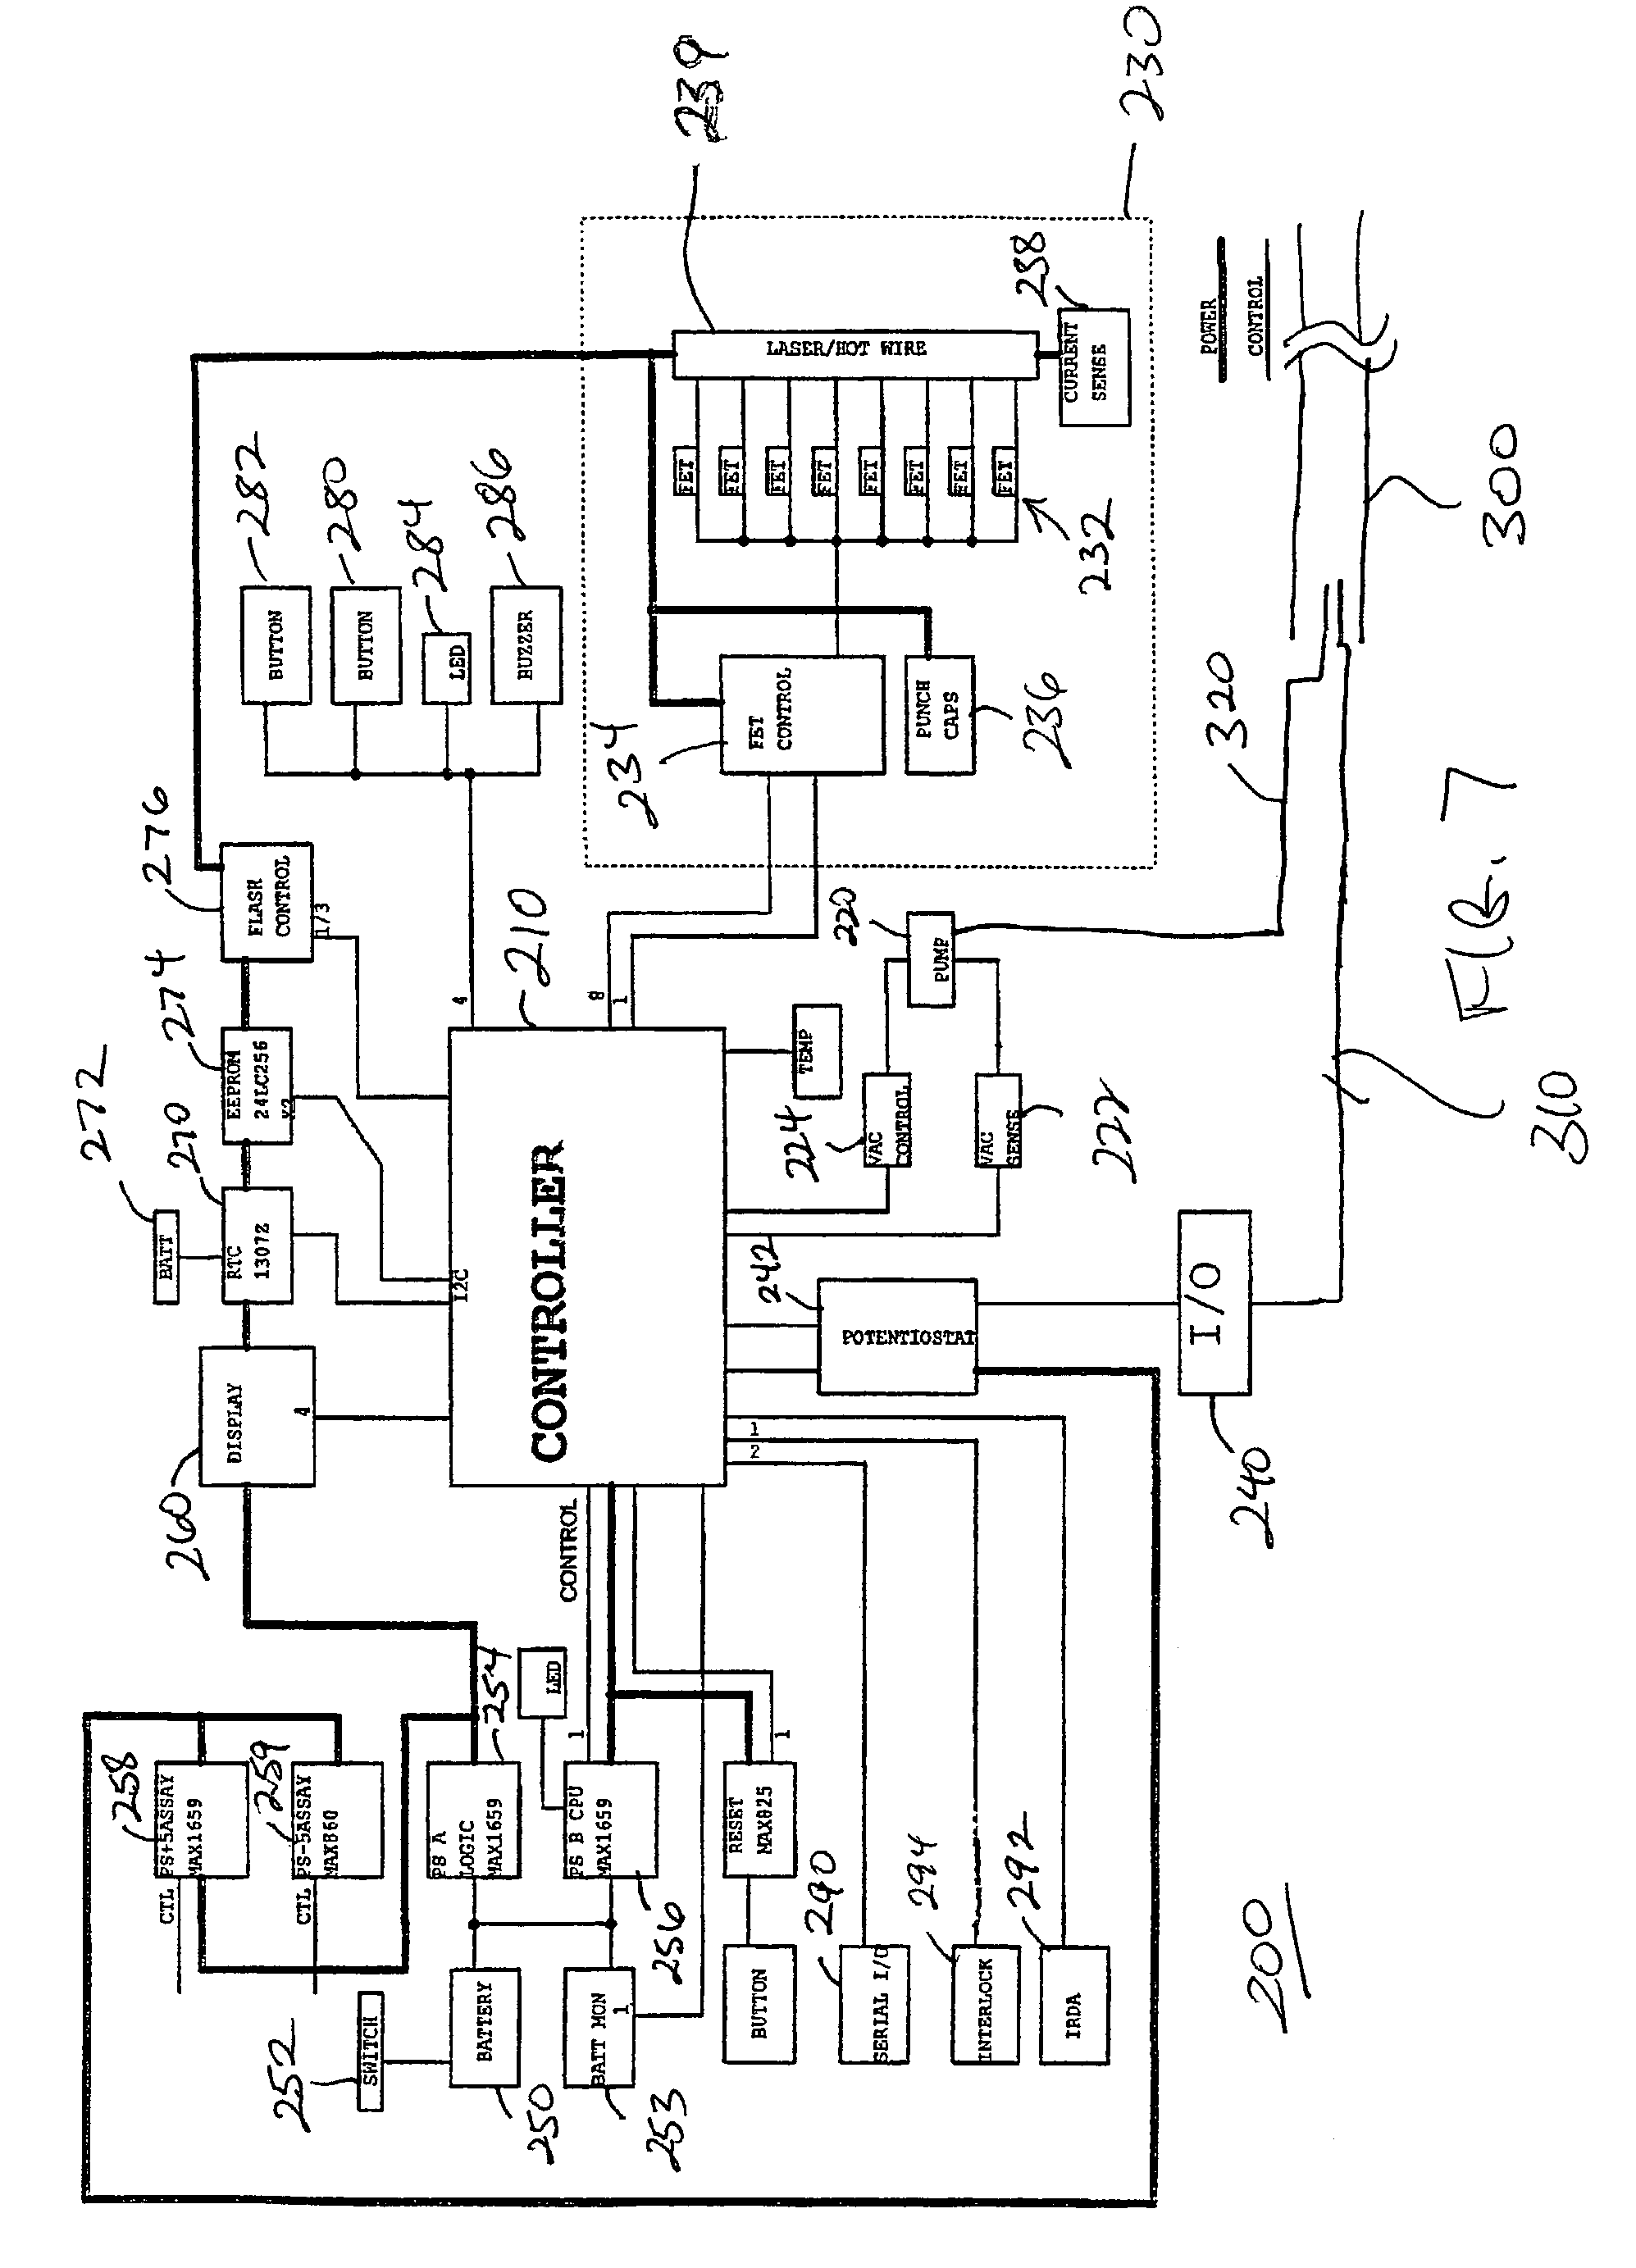 numeric ups circuit diagram electrical wiring diagram house u2022 rh universalservices co numeric 600va ups circuit diagram digital ups circuit diagram